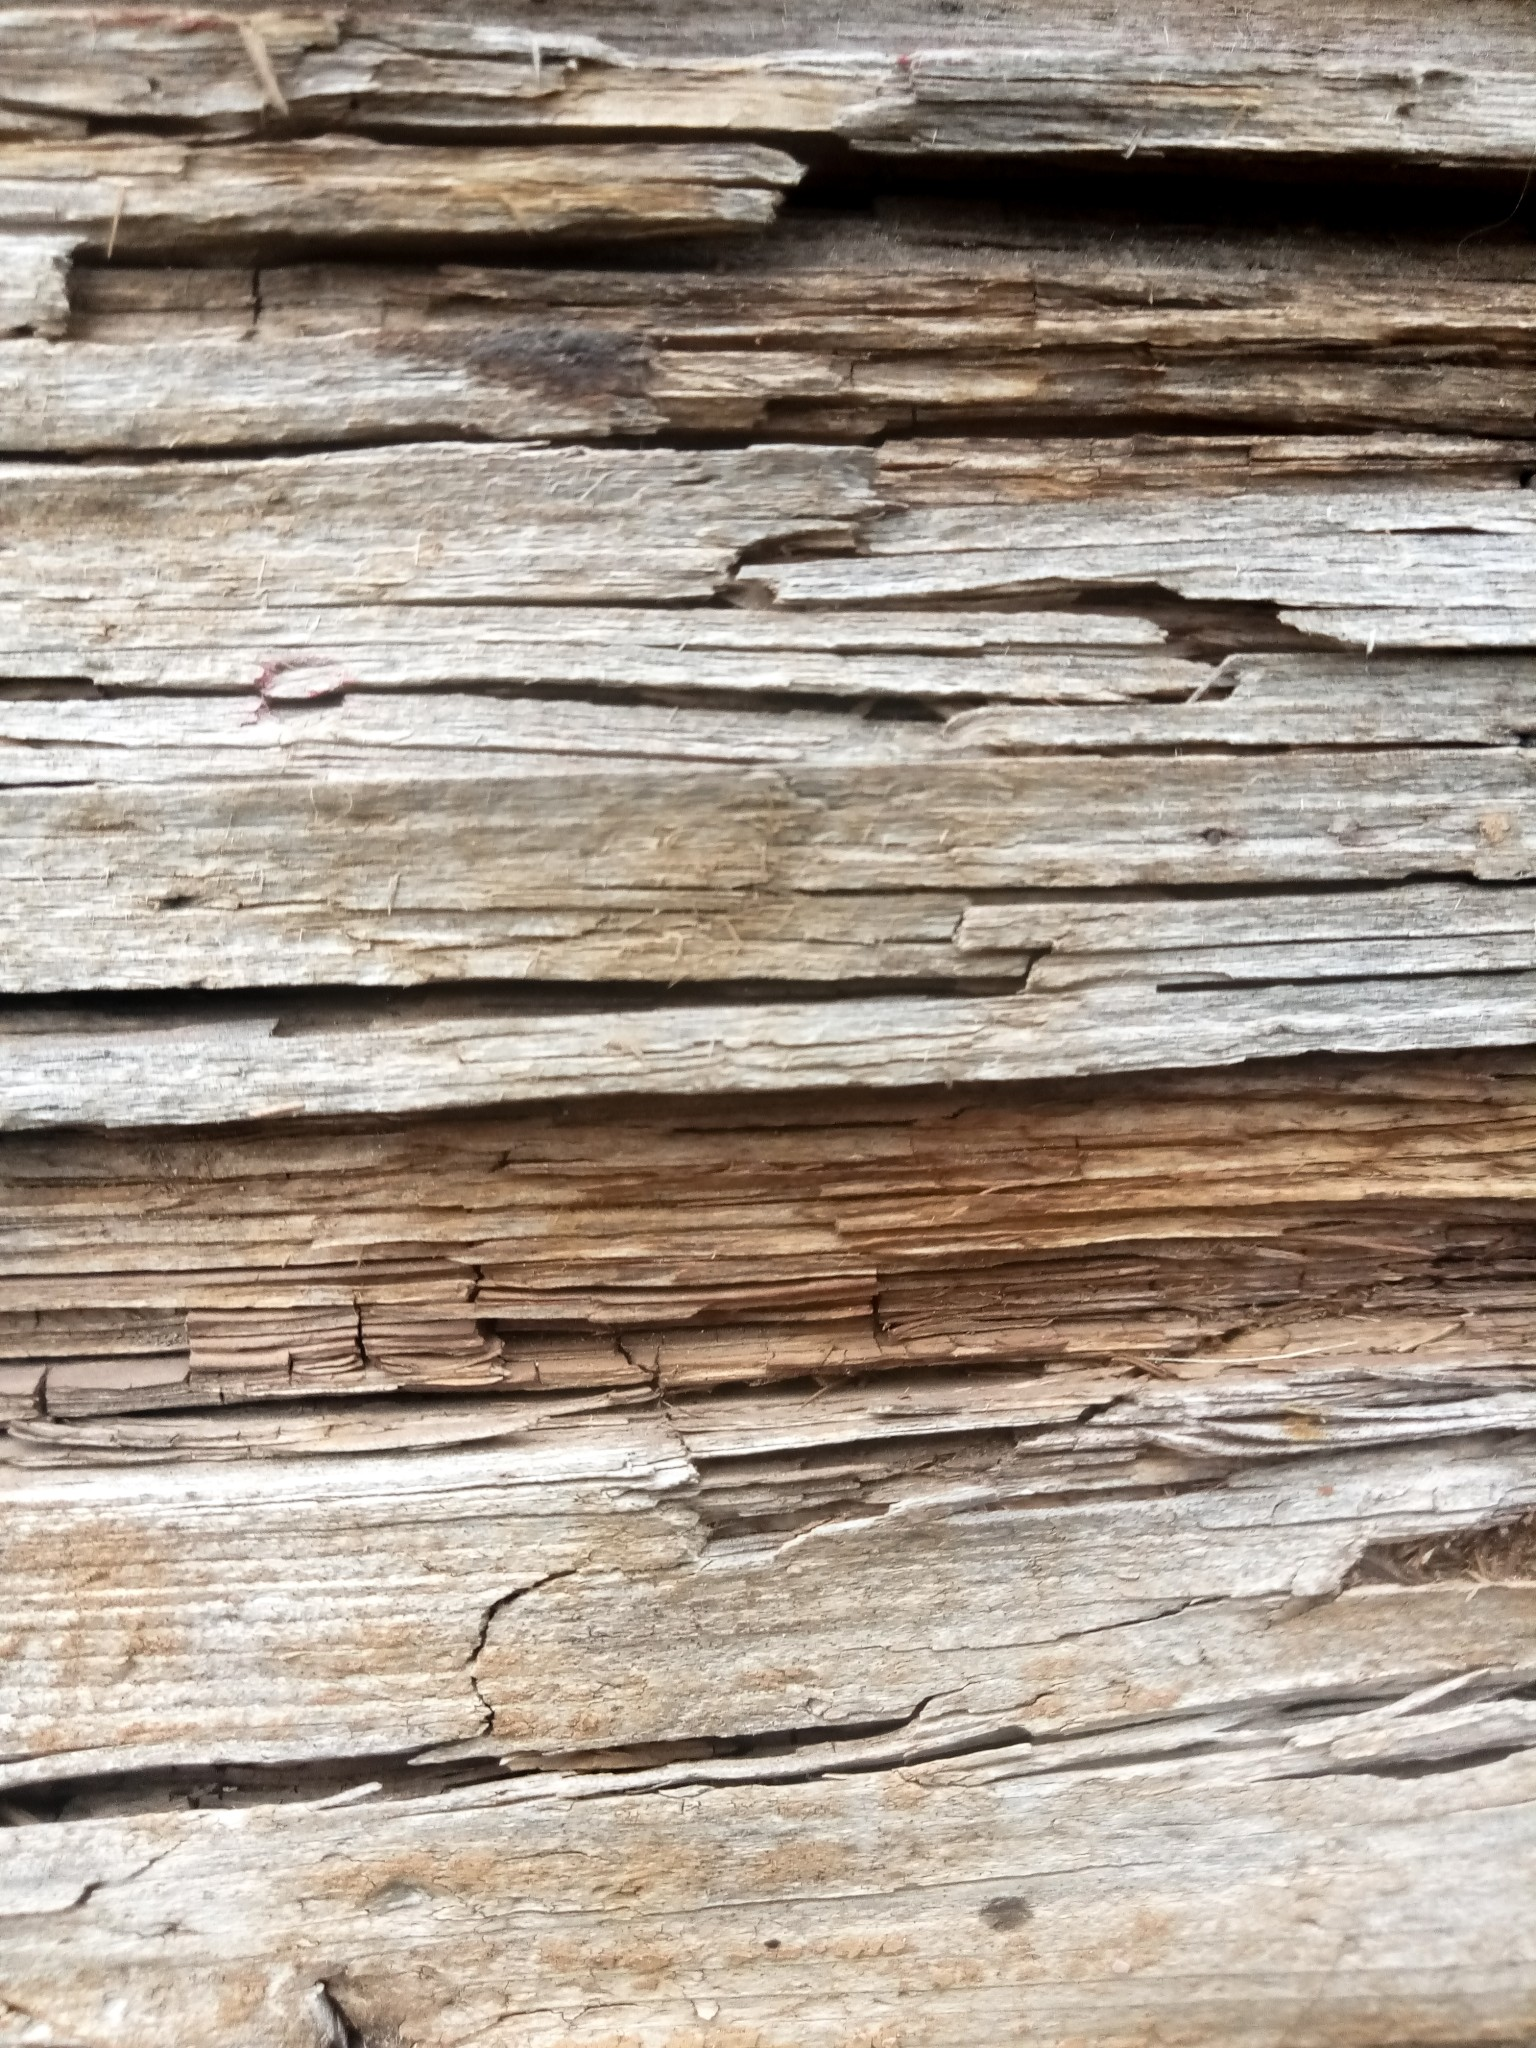 Aesthetic textures